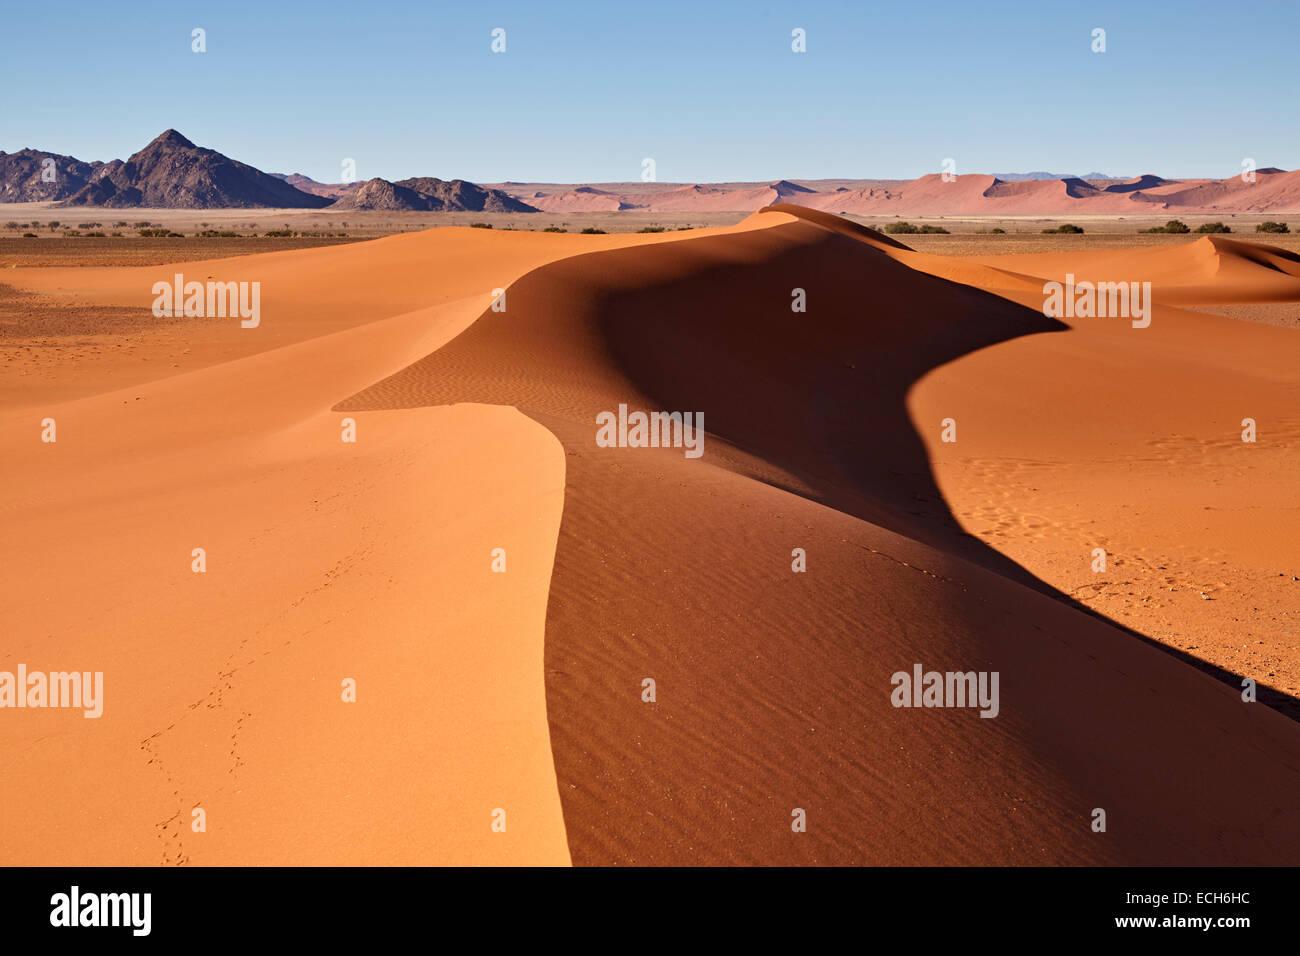 Las dunas de arena, Sossusvlei, desierto de Namib, Namibia Imagen De Stock